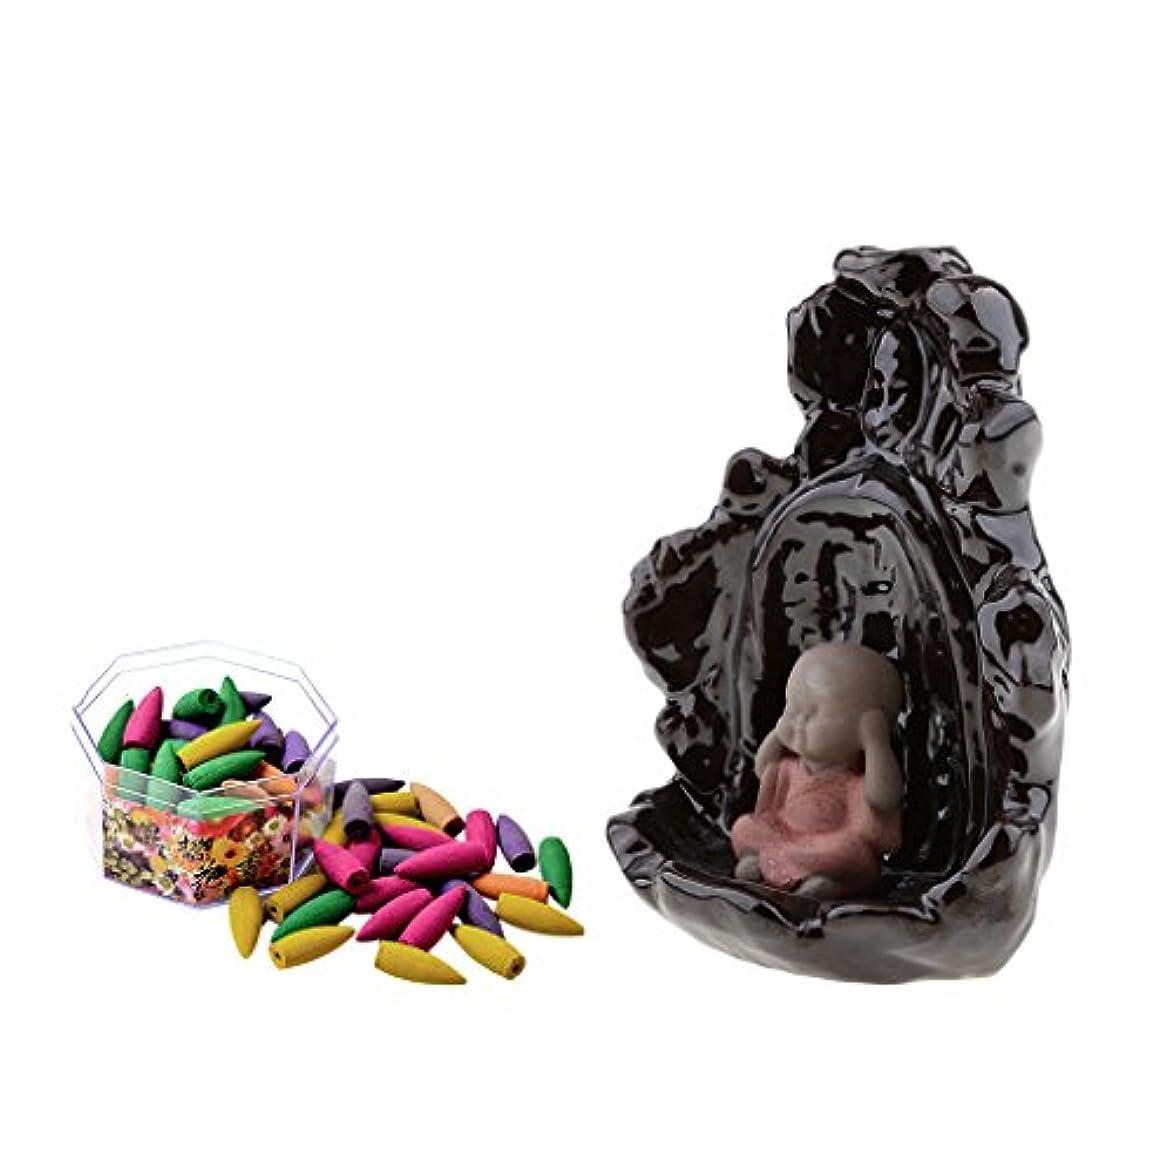 monkeyjack手作り磁器セラミック煙逆流香炉Monk Statue Censer + 70混合Incense Cones炉